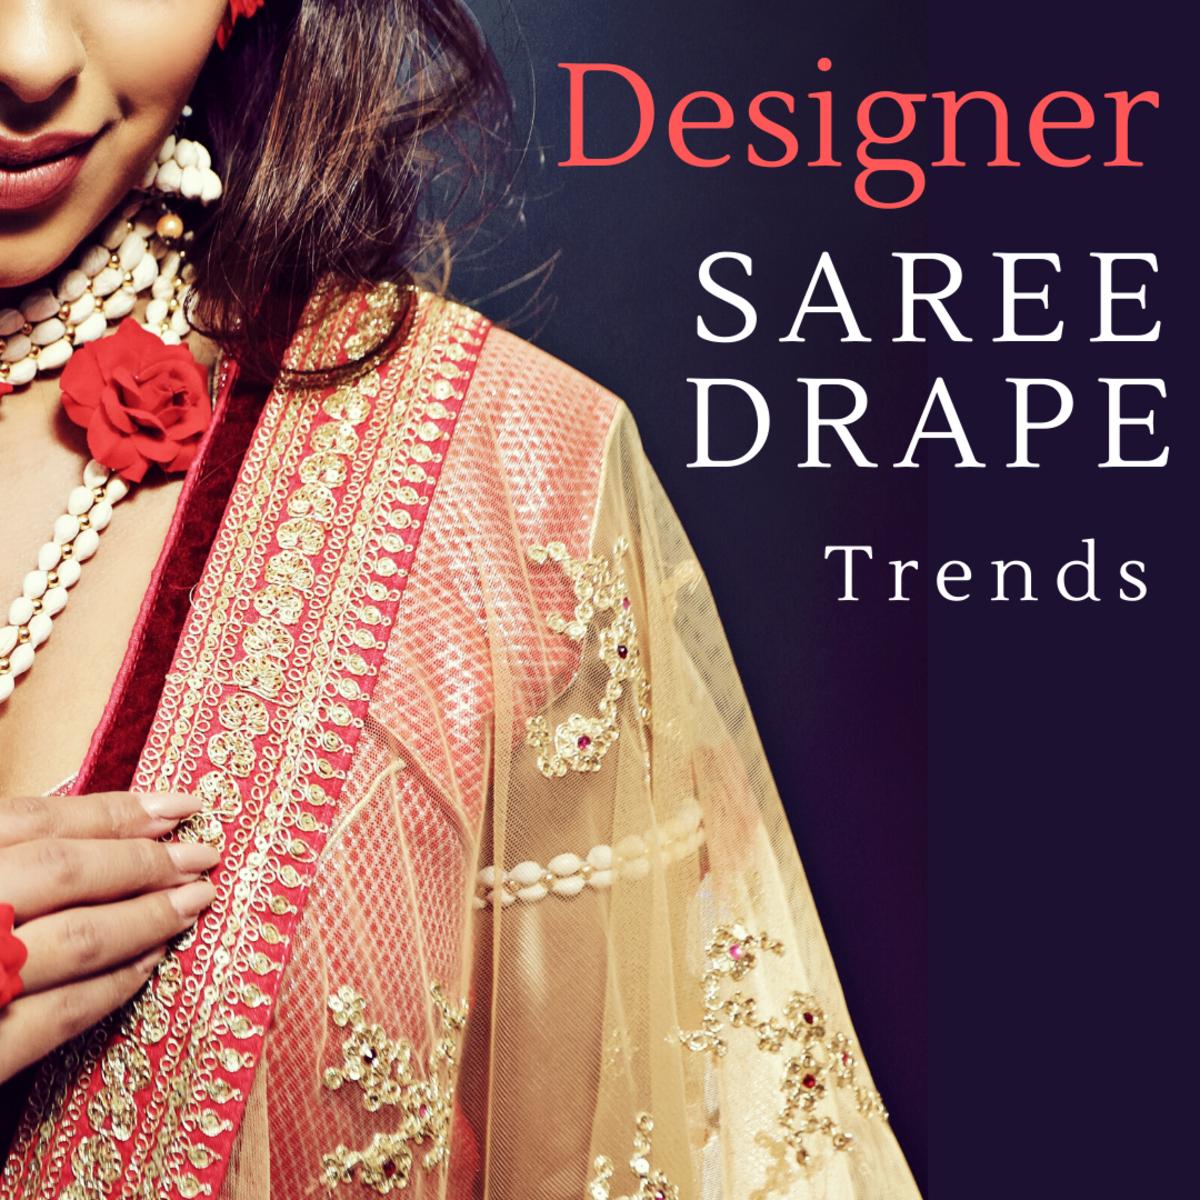 Designer Saree Drapes